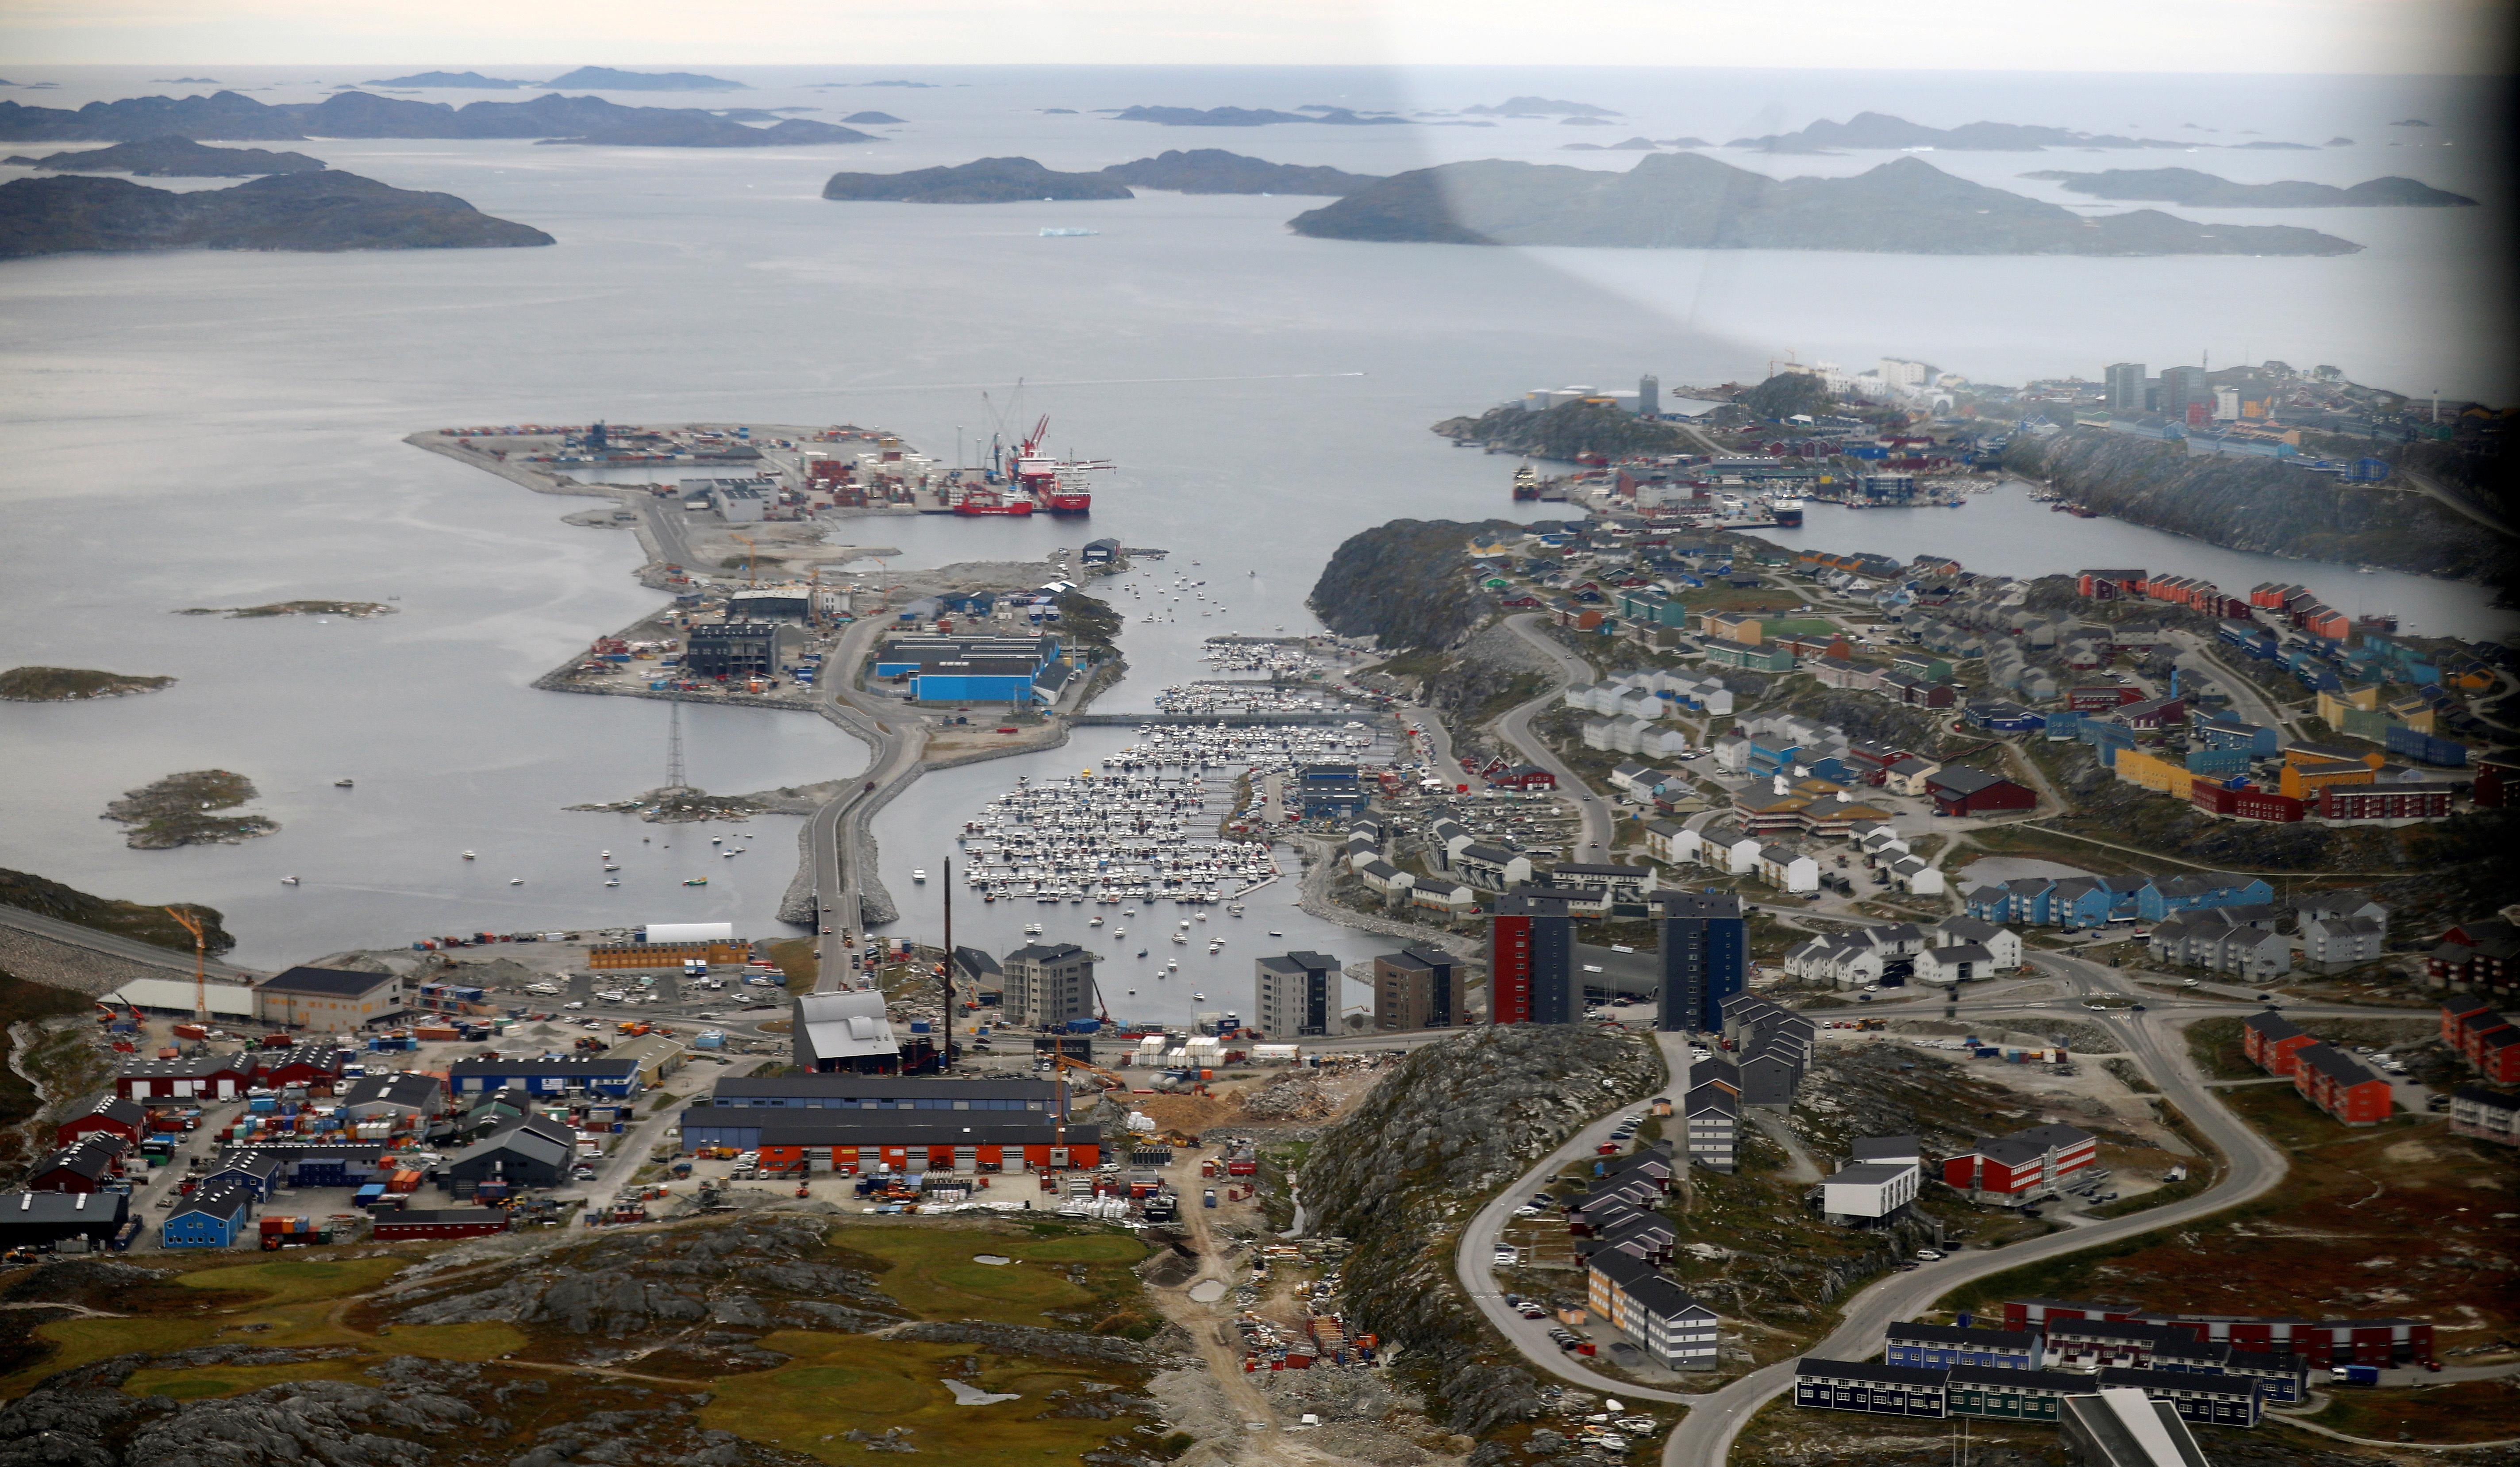 A general view of Nuuk, Greenland, September 11, 2021. REUTERS/Hannibal Hanschke